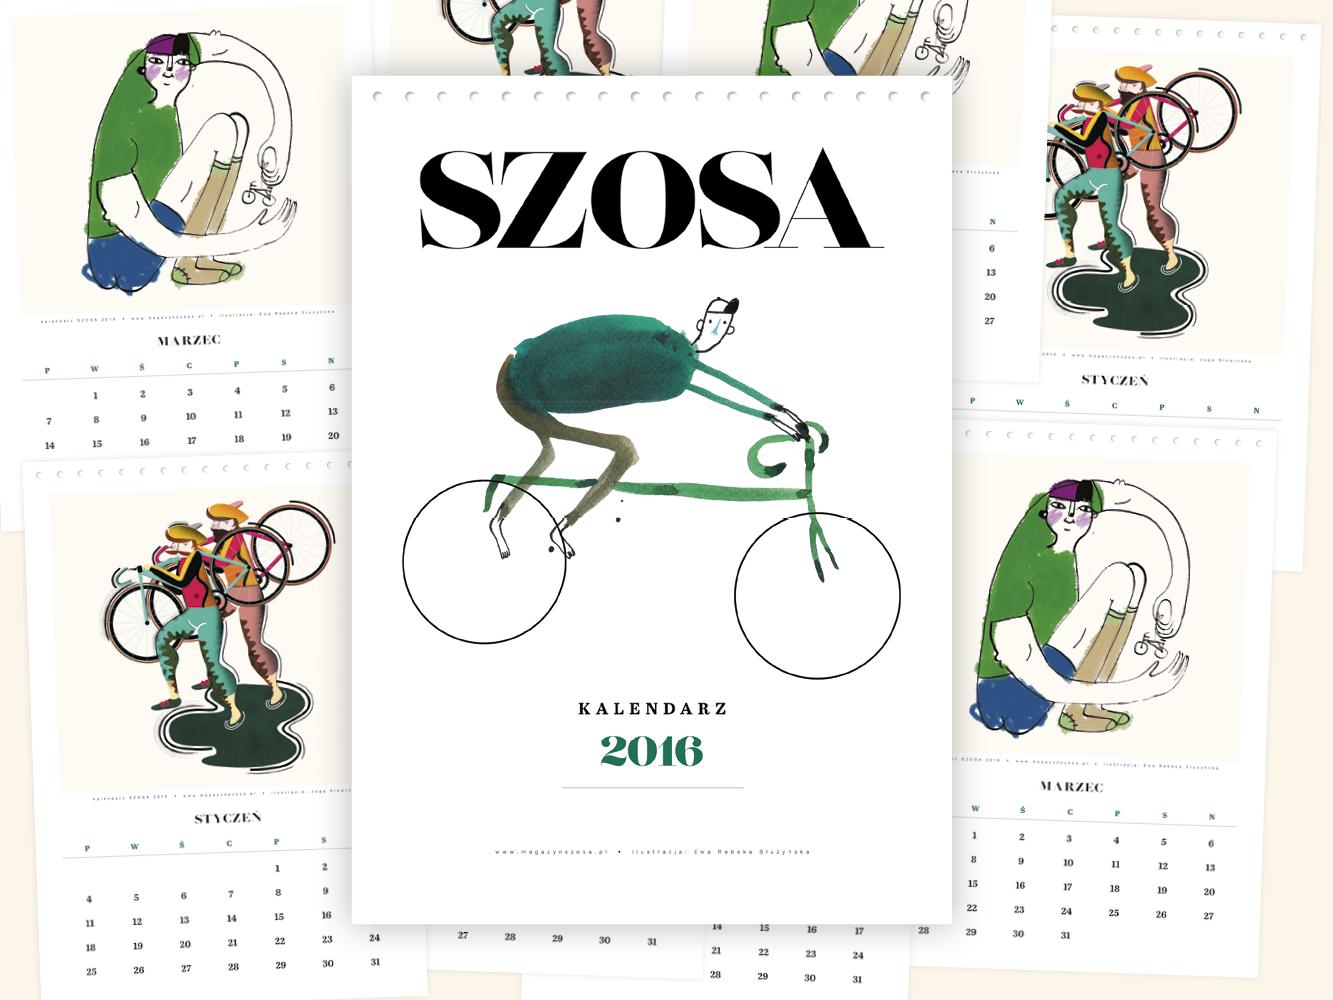 Szosa-Kalendarz 2016-Zapowiedz-1